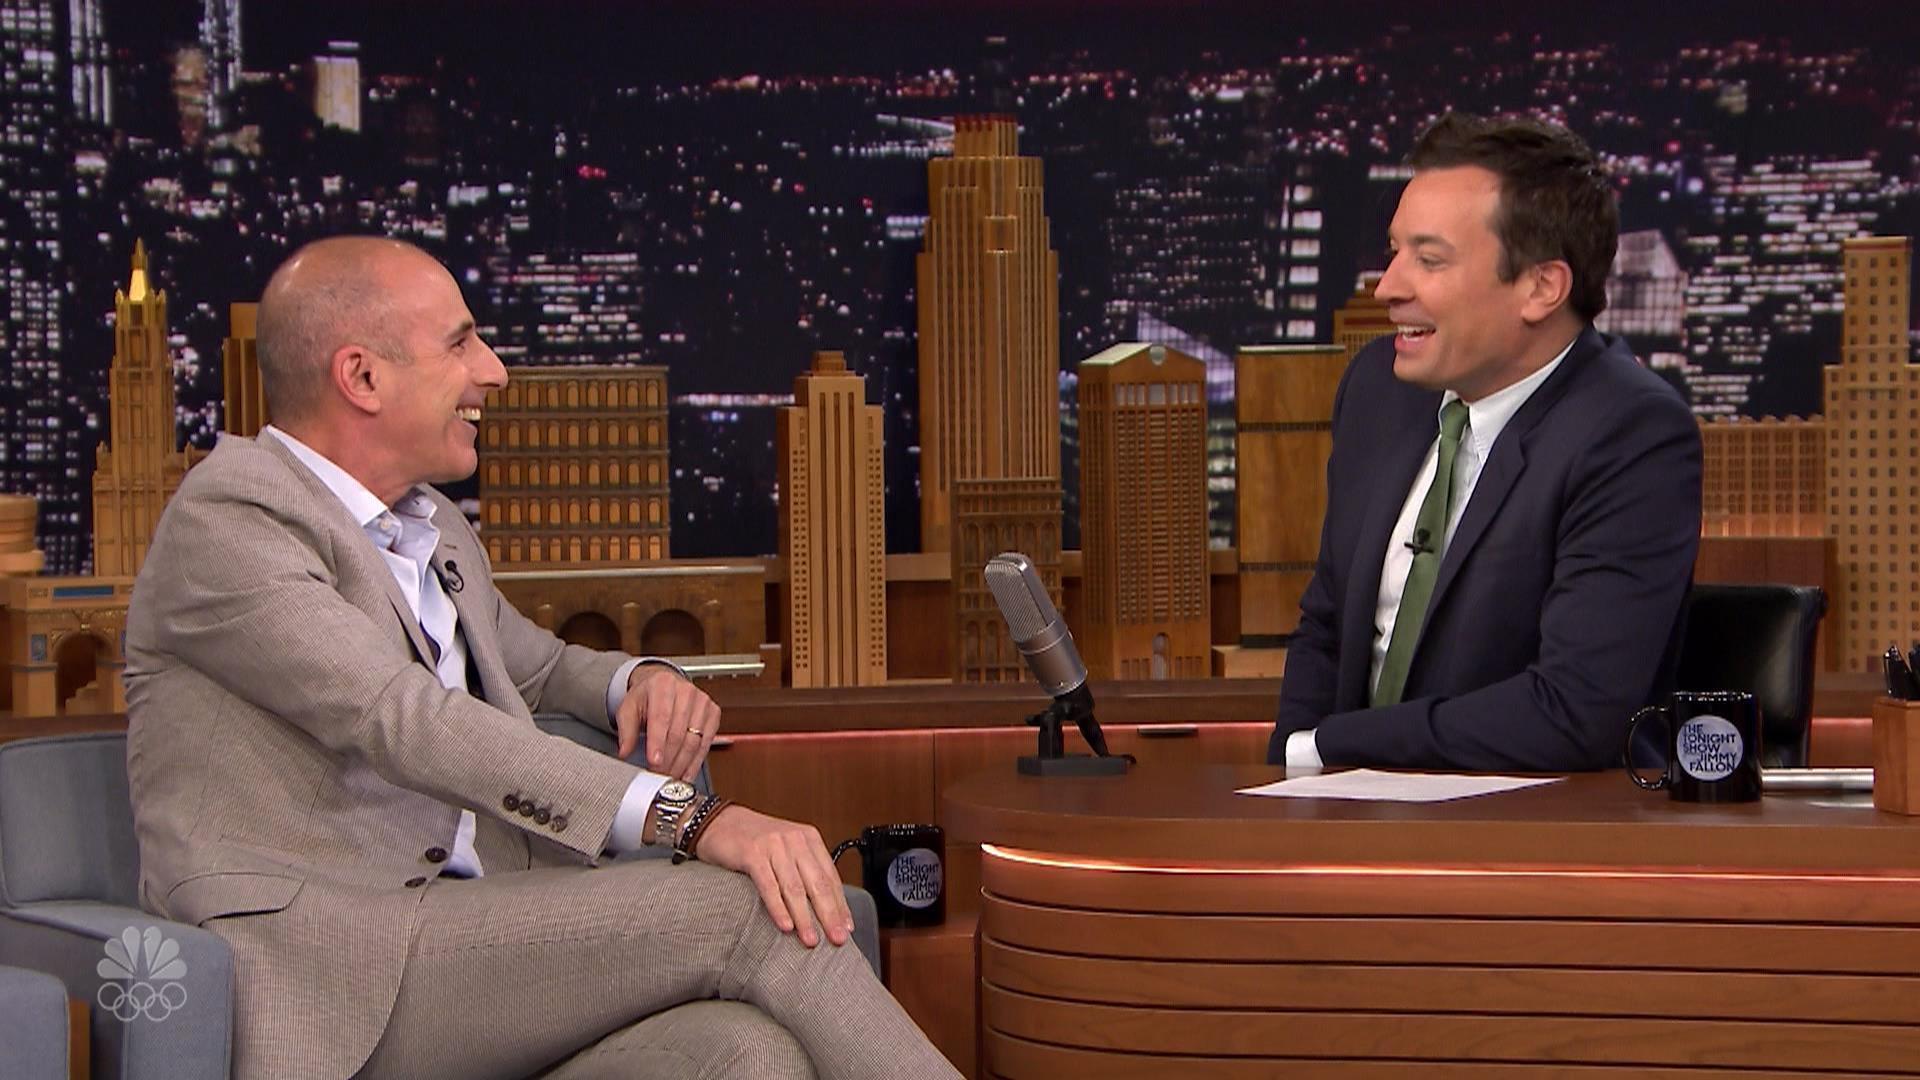 Jimmy Fallon Teases Matt Lauer About His Hair